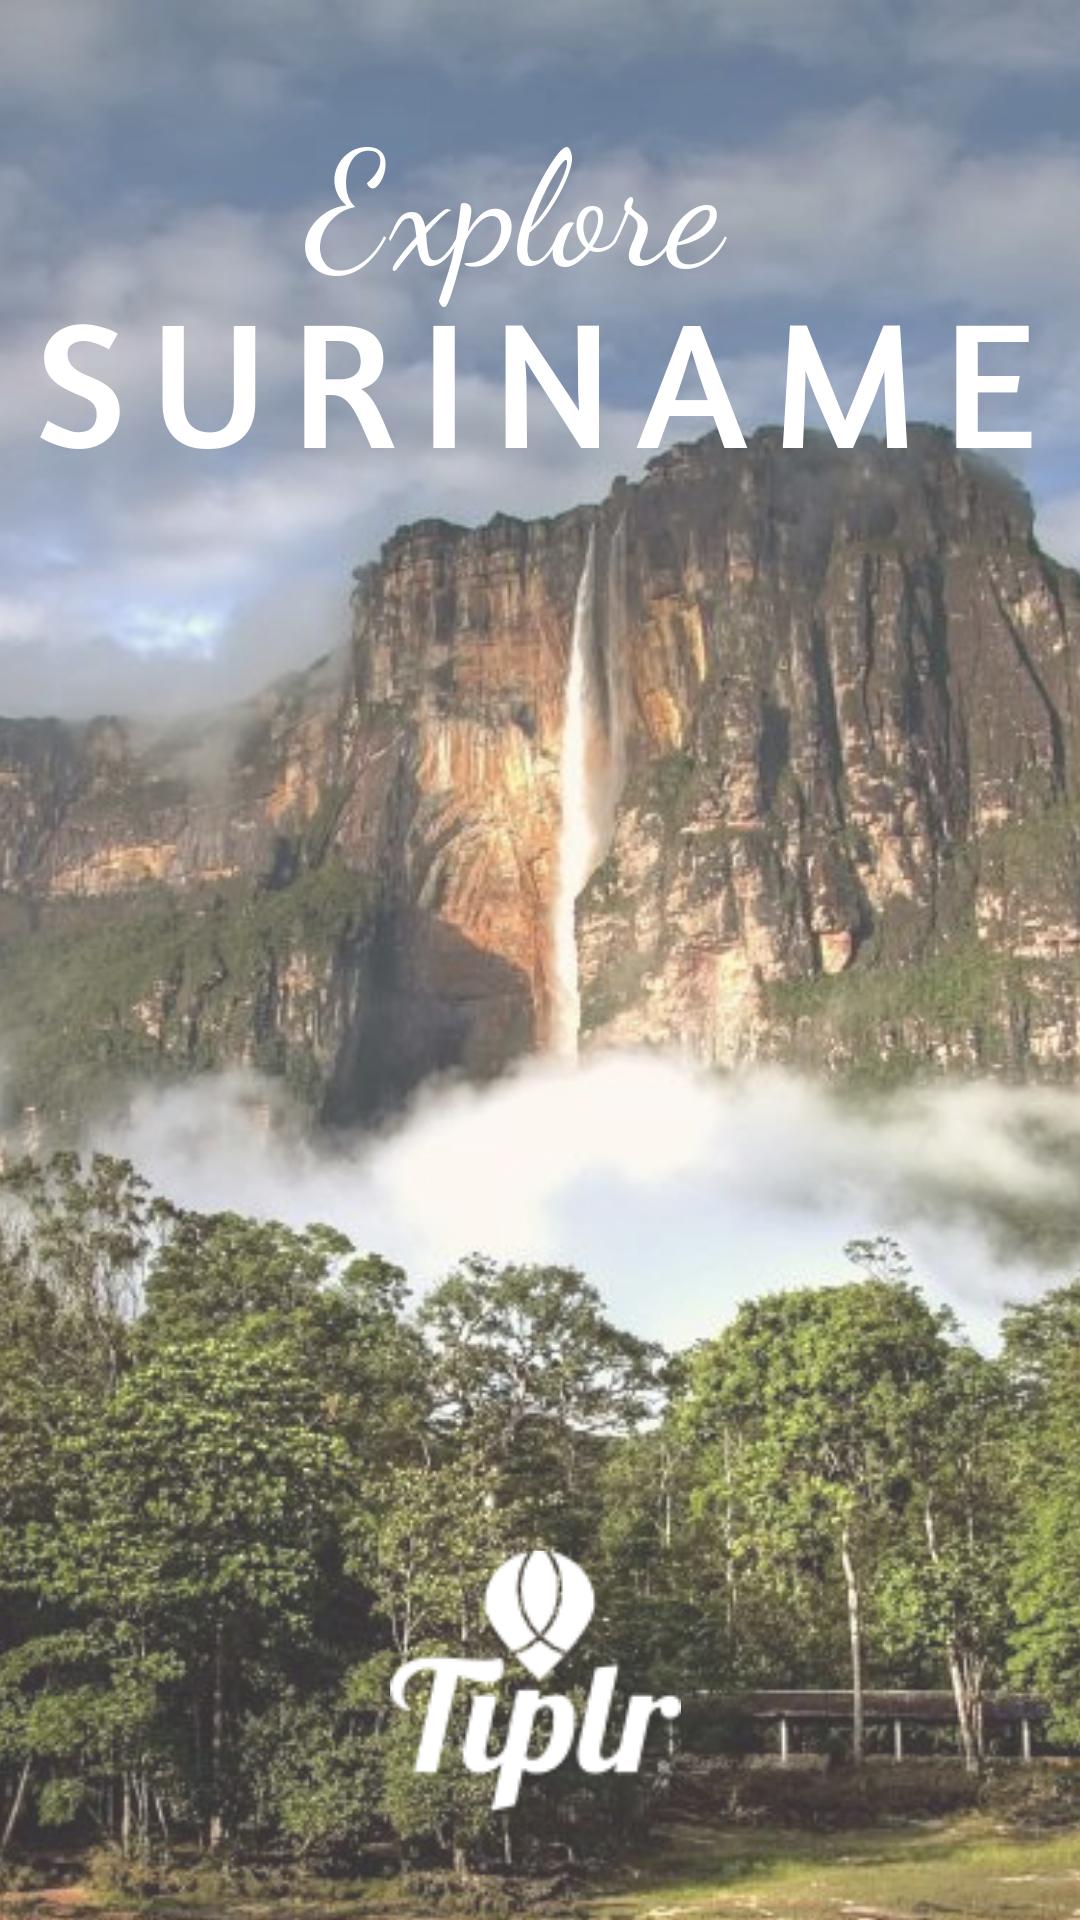 Located on South America's northeastern coast, Suriname